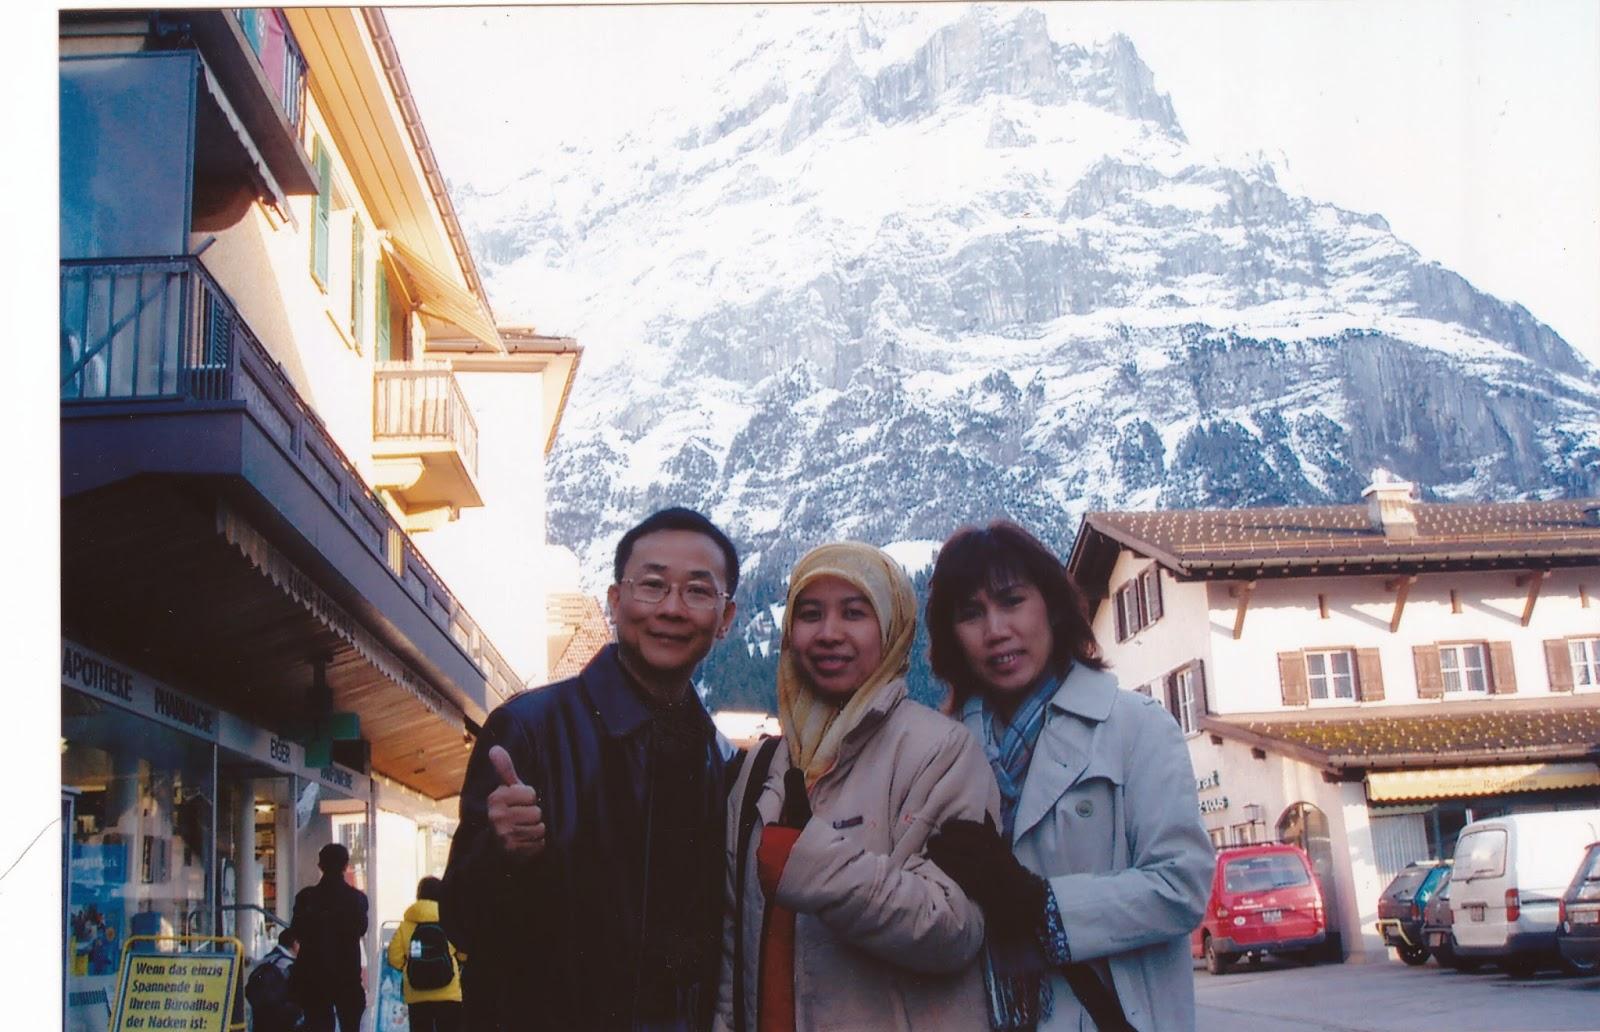 Yang Ni Ialah Salah Satu Daripada Beberapa Restoran Di Switzerland Tempat Kami Menjamu Selera Seperti Biasa Lifestyle Shaklee Seluruh Akan